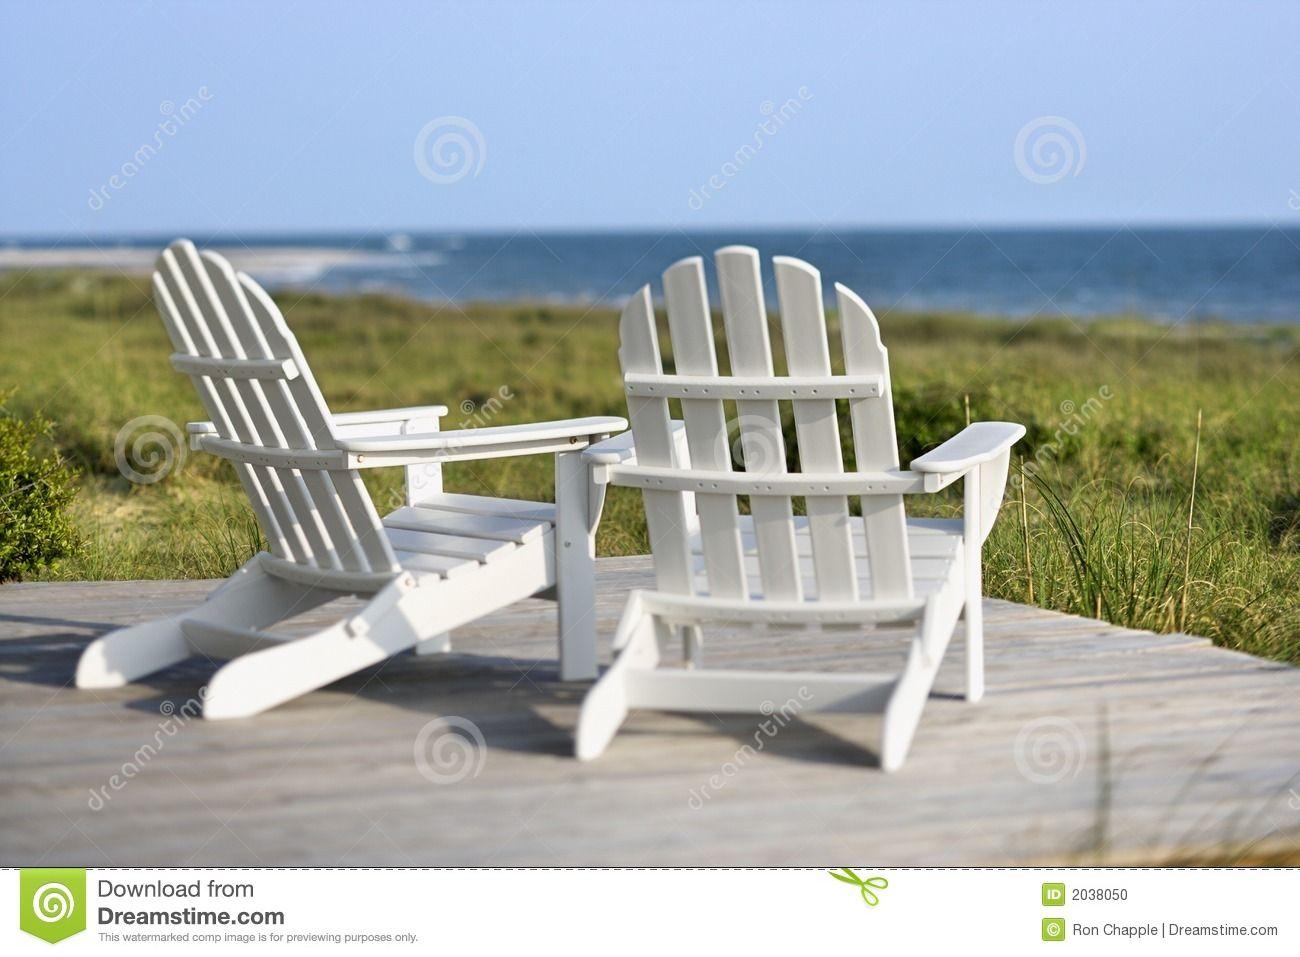 adirondack chairs on beach Google Search Art Journals